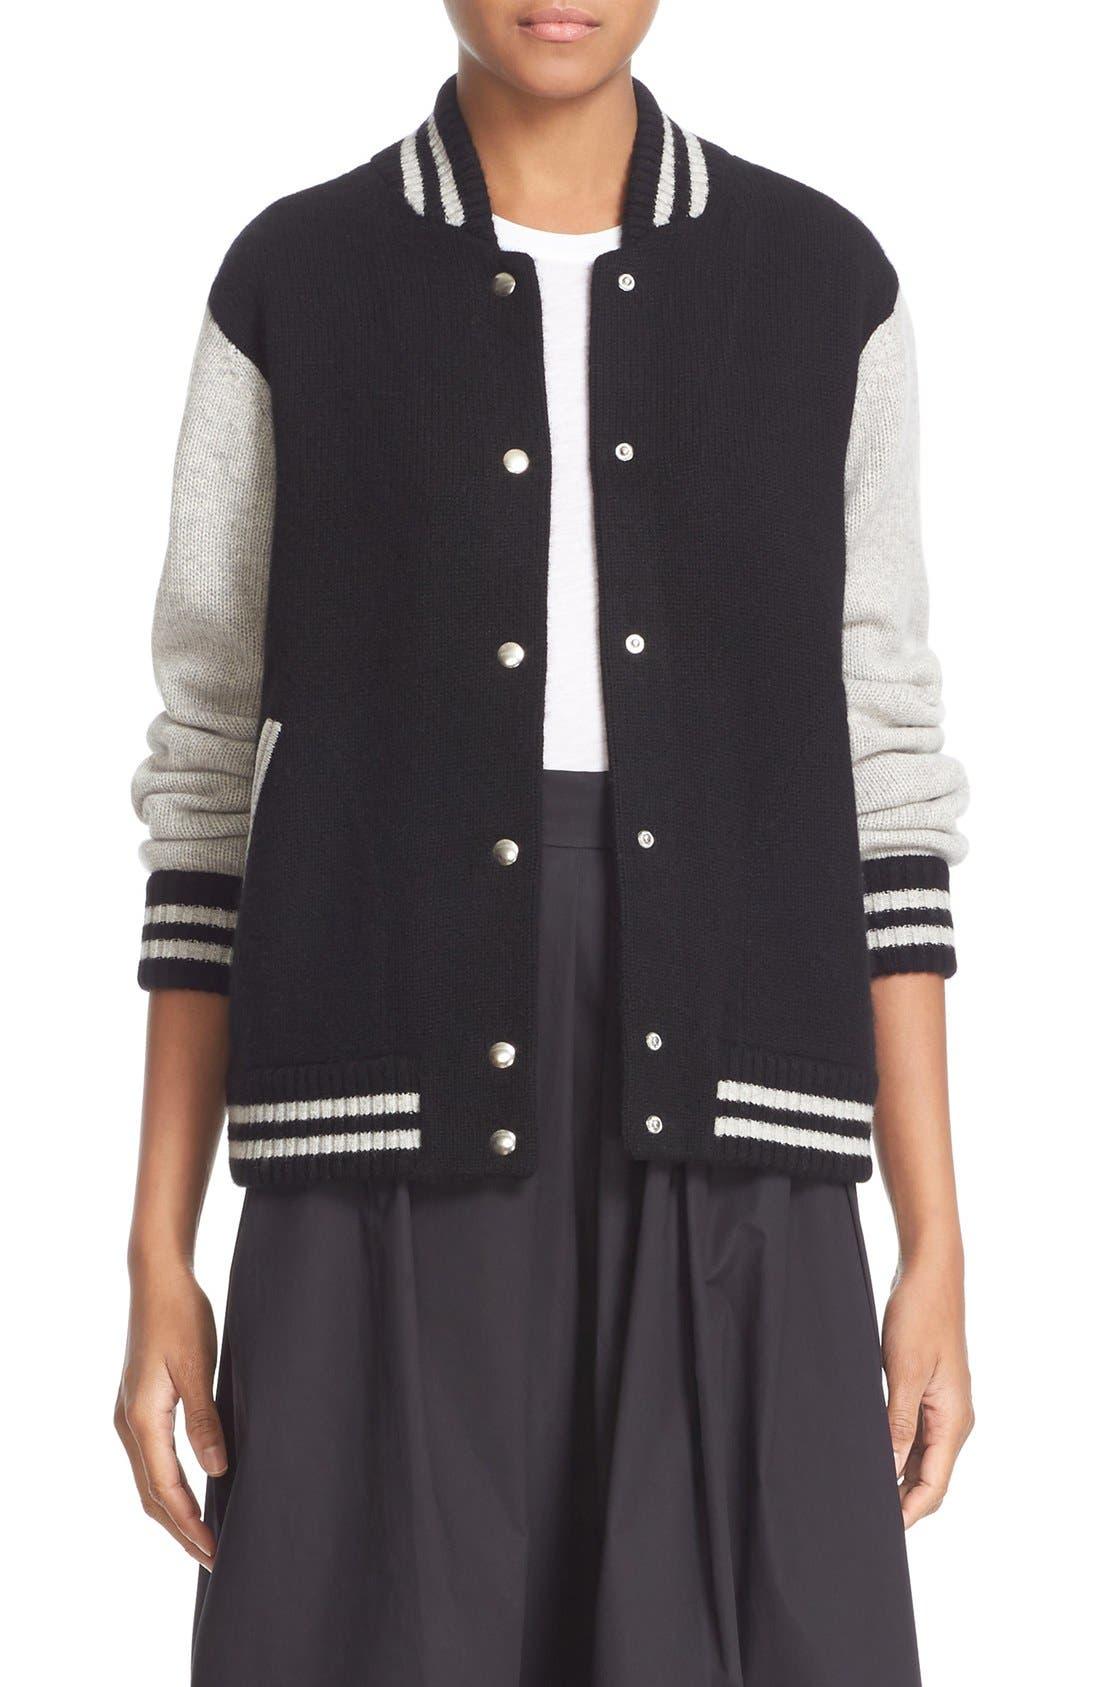 Stripe Detail Wool & Cashmere Knit Varsity Jacket,                         Main,                         color, 002